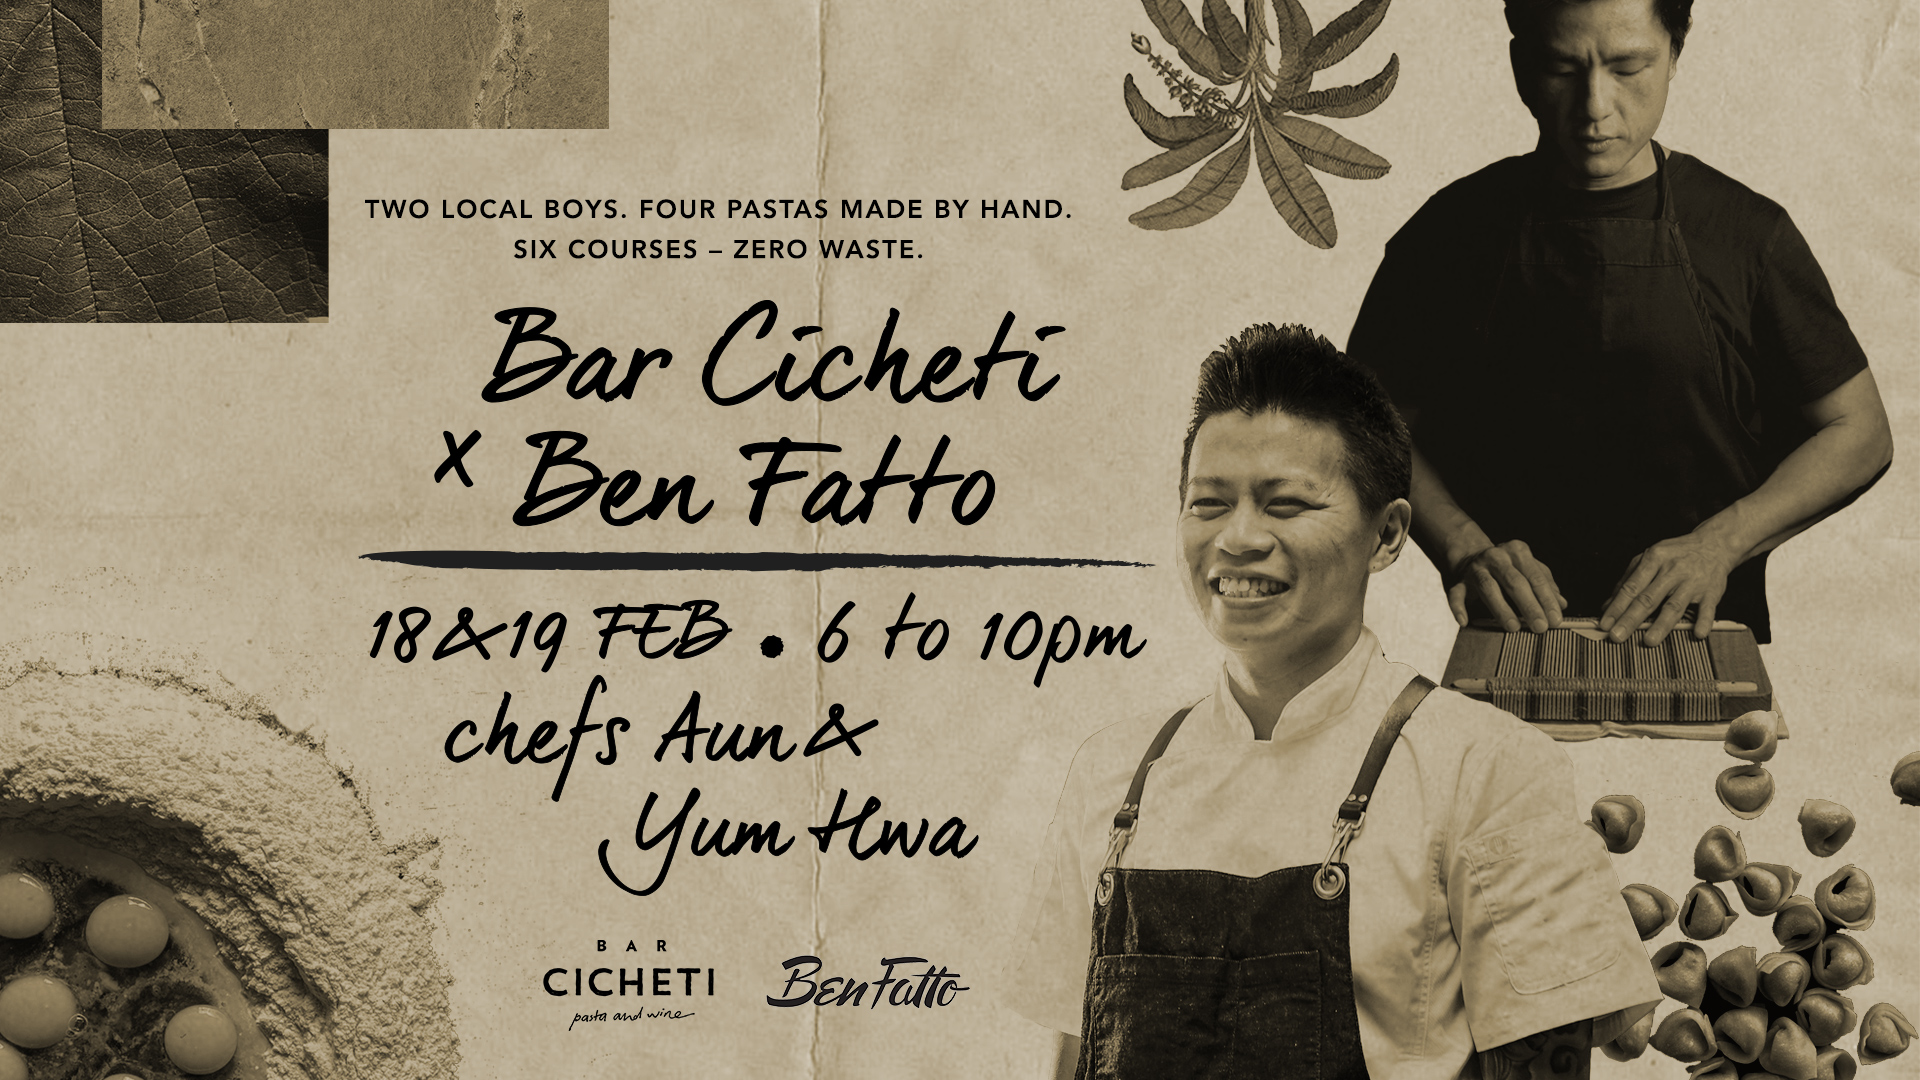 environment: Bar Cicheti x Ben Fatto